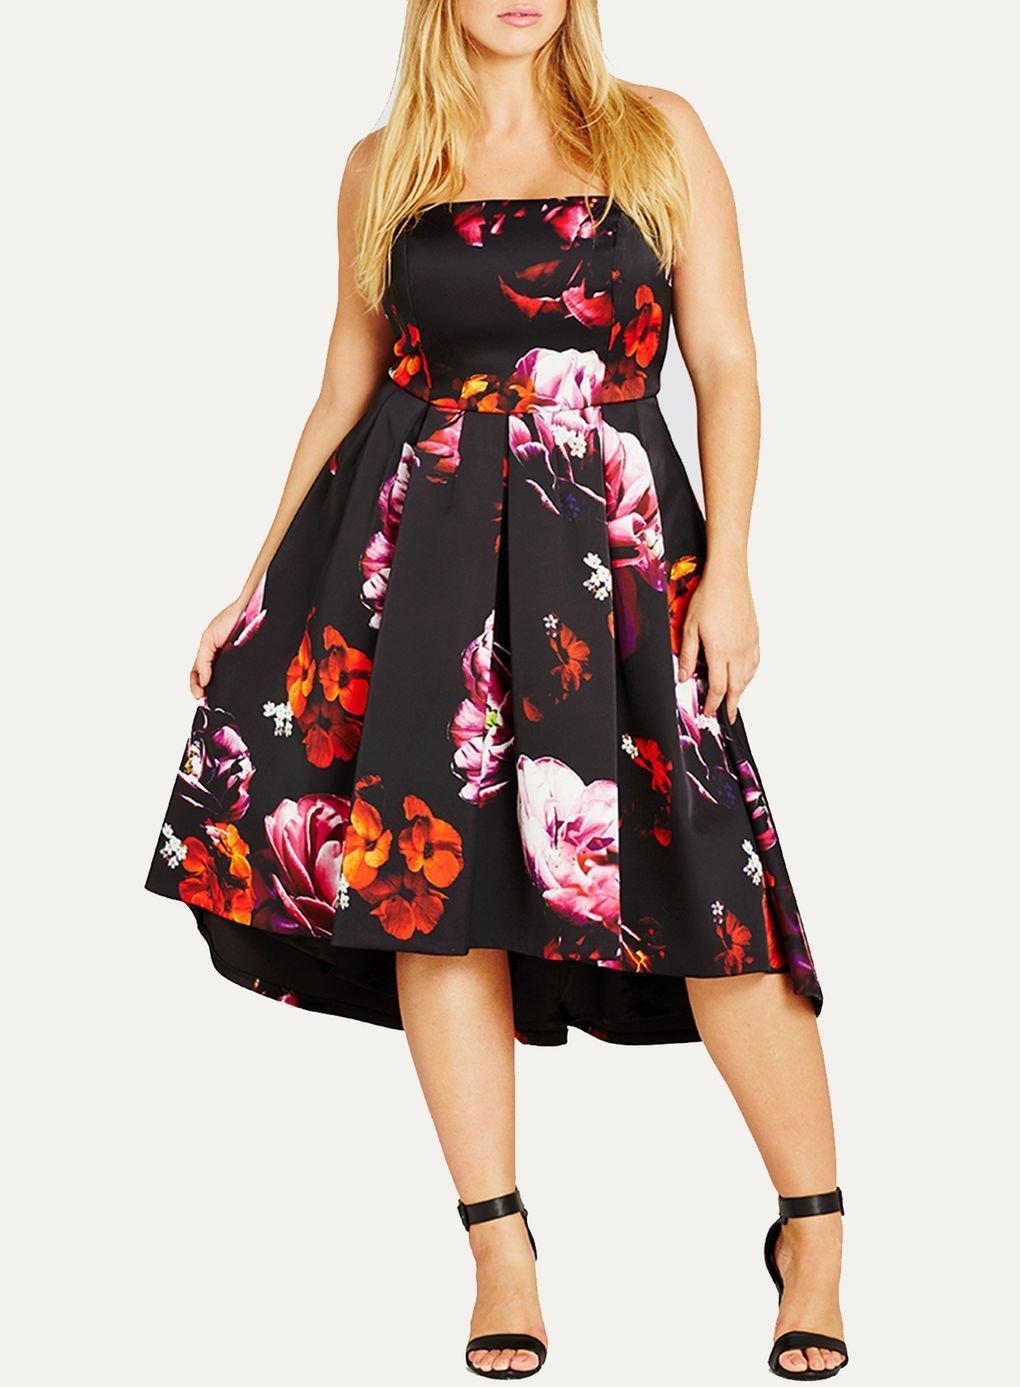 f9a7a58f32 Evans   city Chic Black Floral Print Skater Dress in Black - Lyst